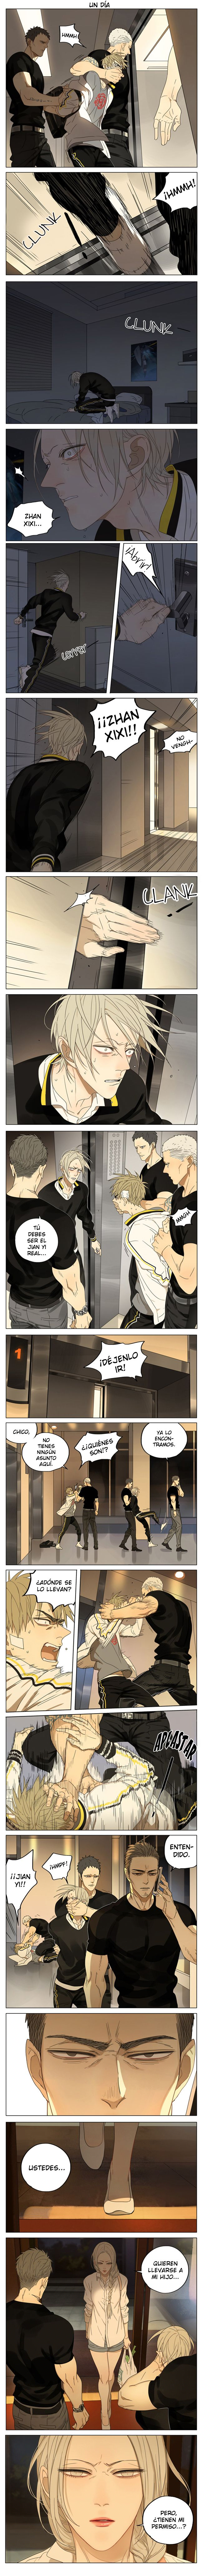 http://c5.ninemanga.com/es_manga/7/15943/479377/d8c3fc67def99b7b61593abe7920f3c0.jpg Page 2